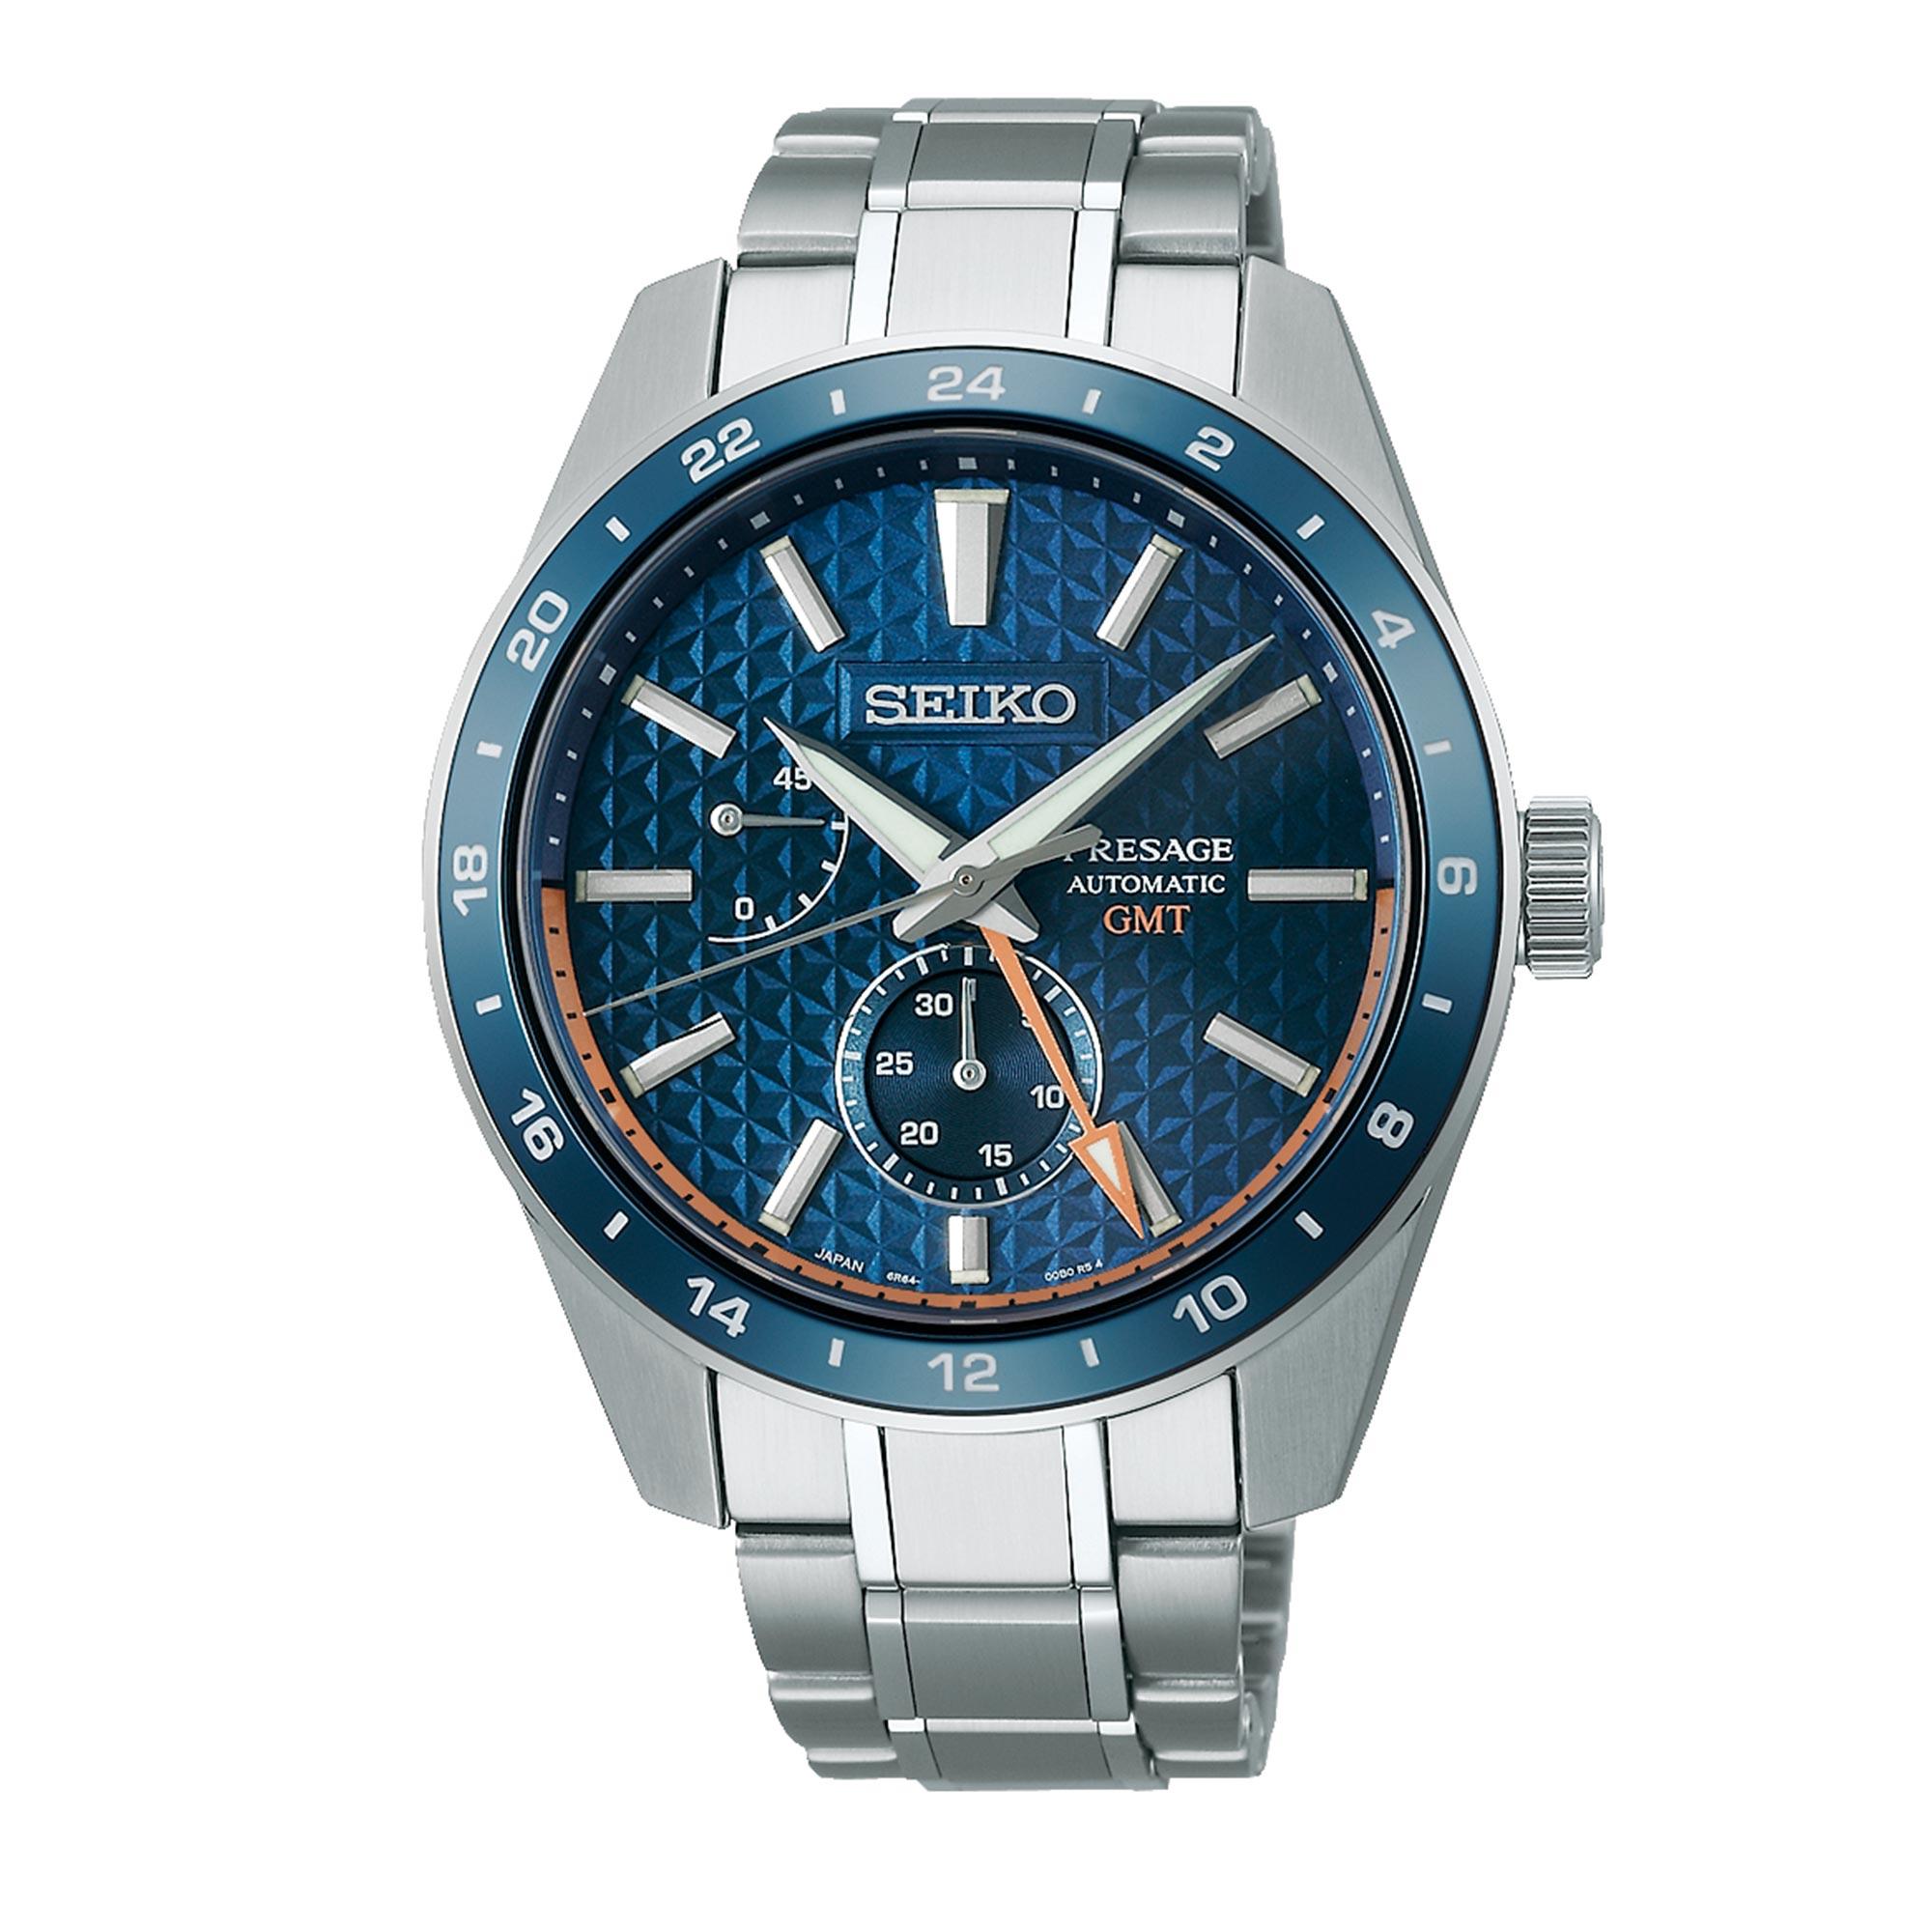 Seiko Presage Sharp Edged Series Automatic Movement Blue Dial Stainless Steel Bracelet SPB217J1